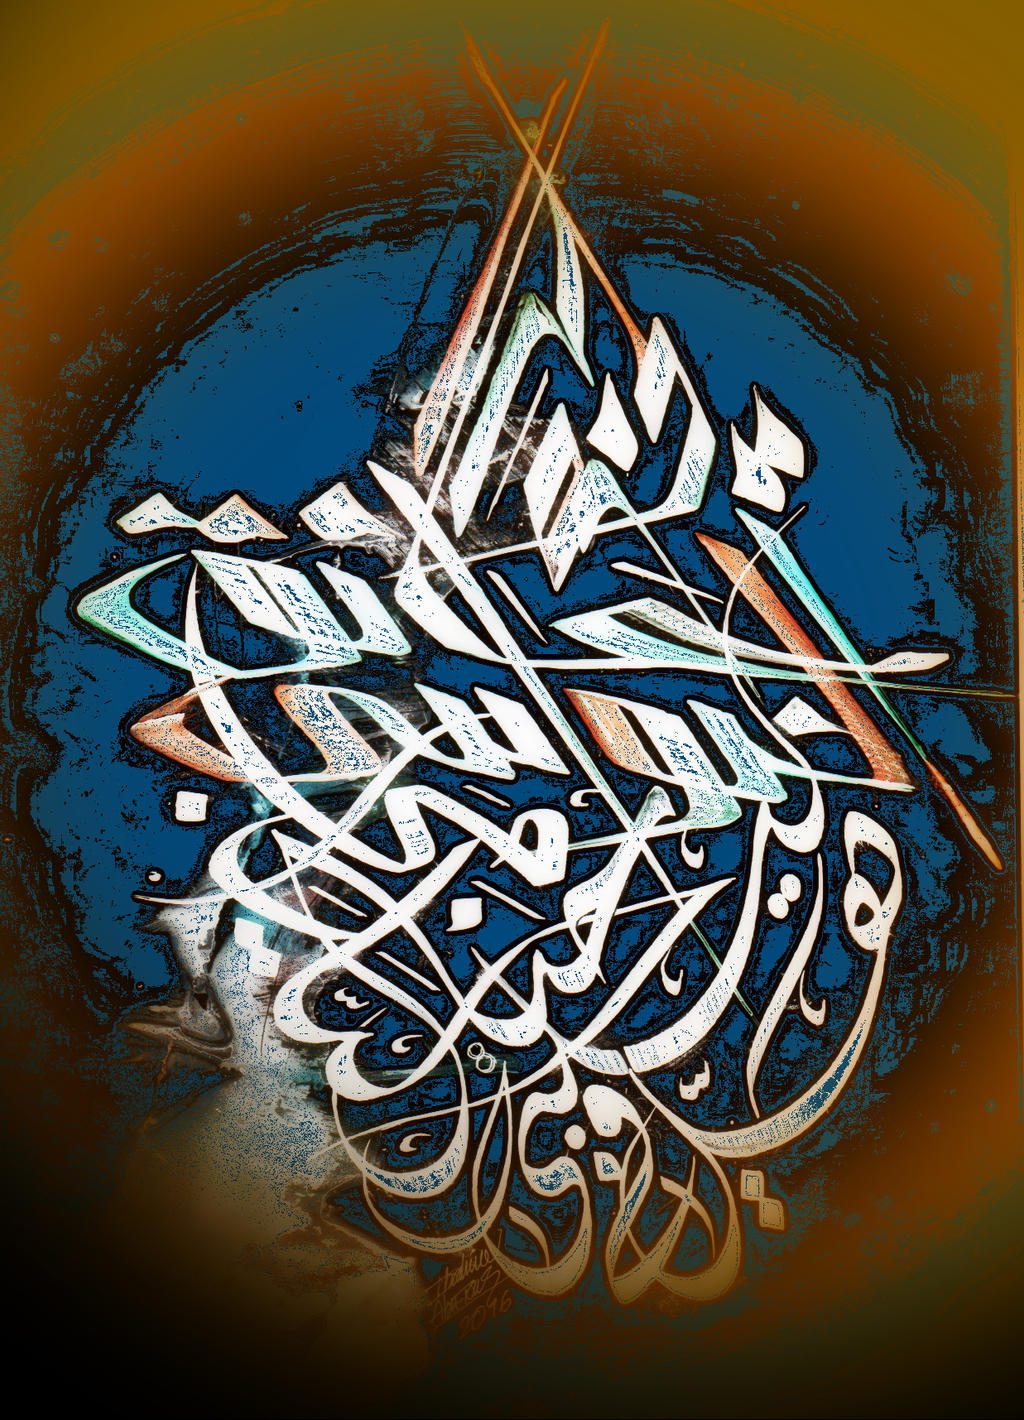 abdull wahab 7 by ibrahimabutouq